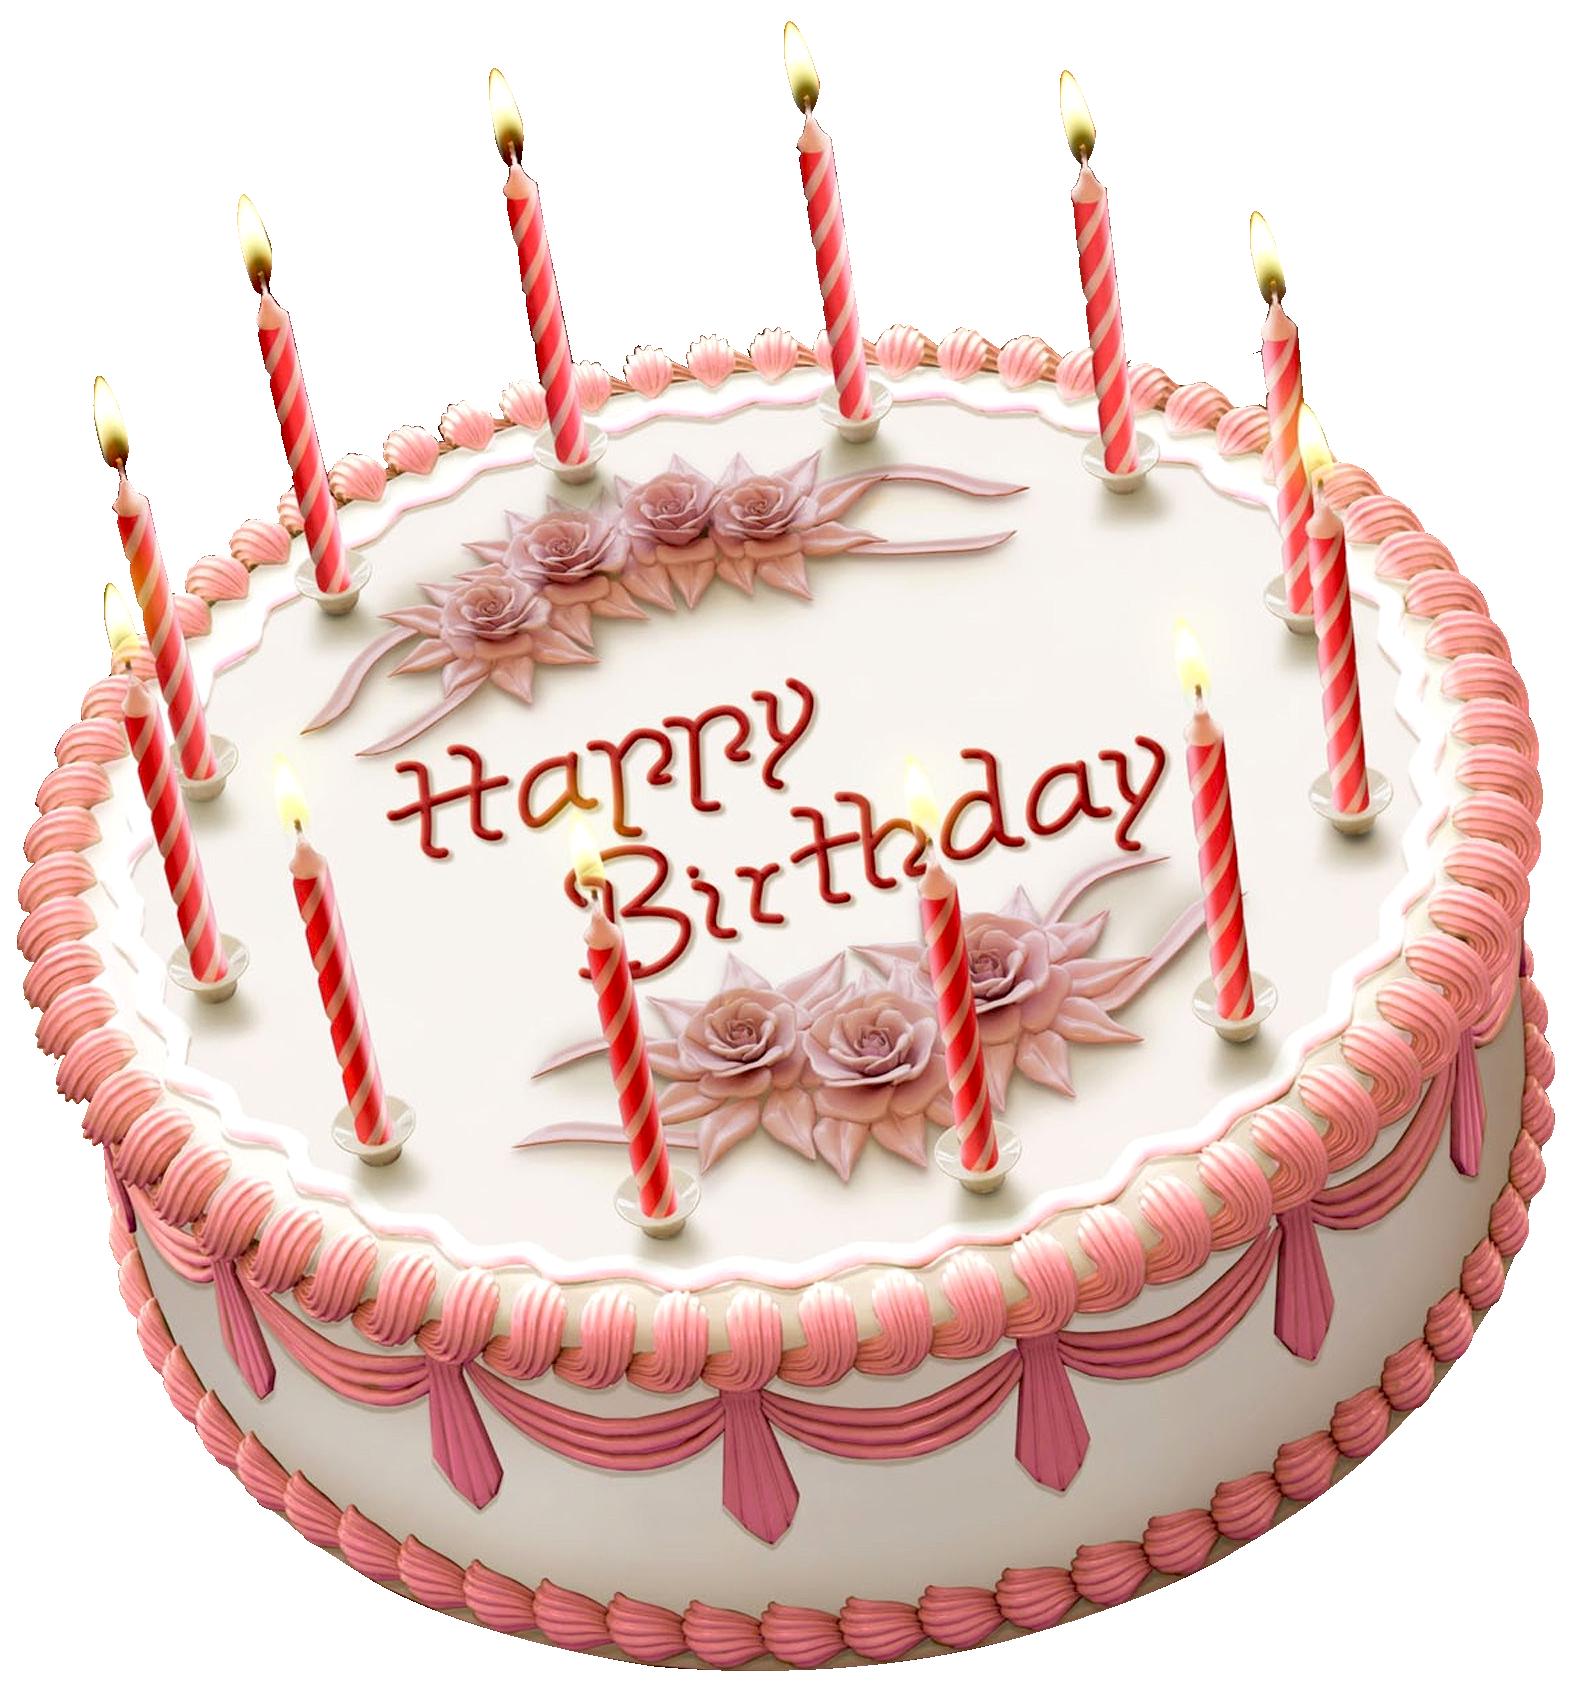 Cake PNG images free download, birthday cake PNG images free download.